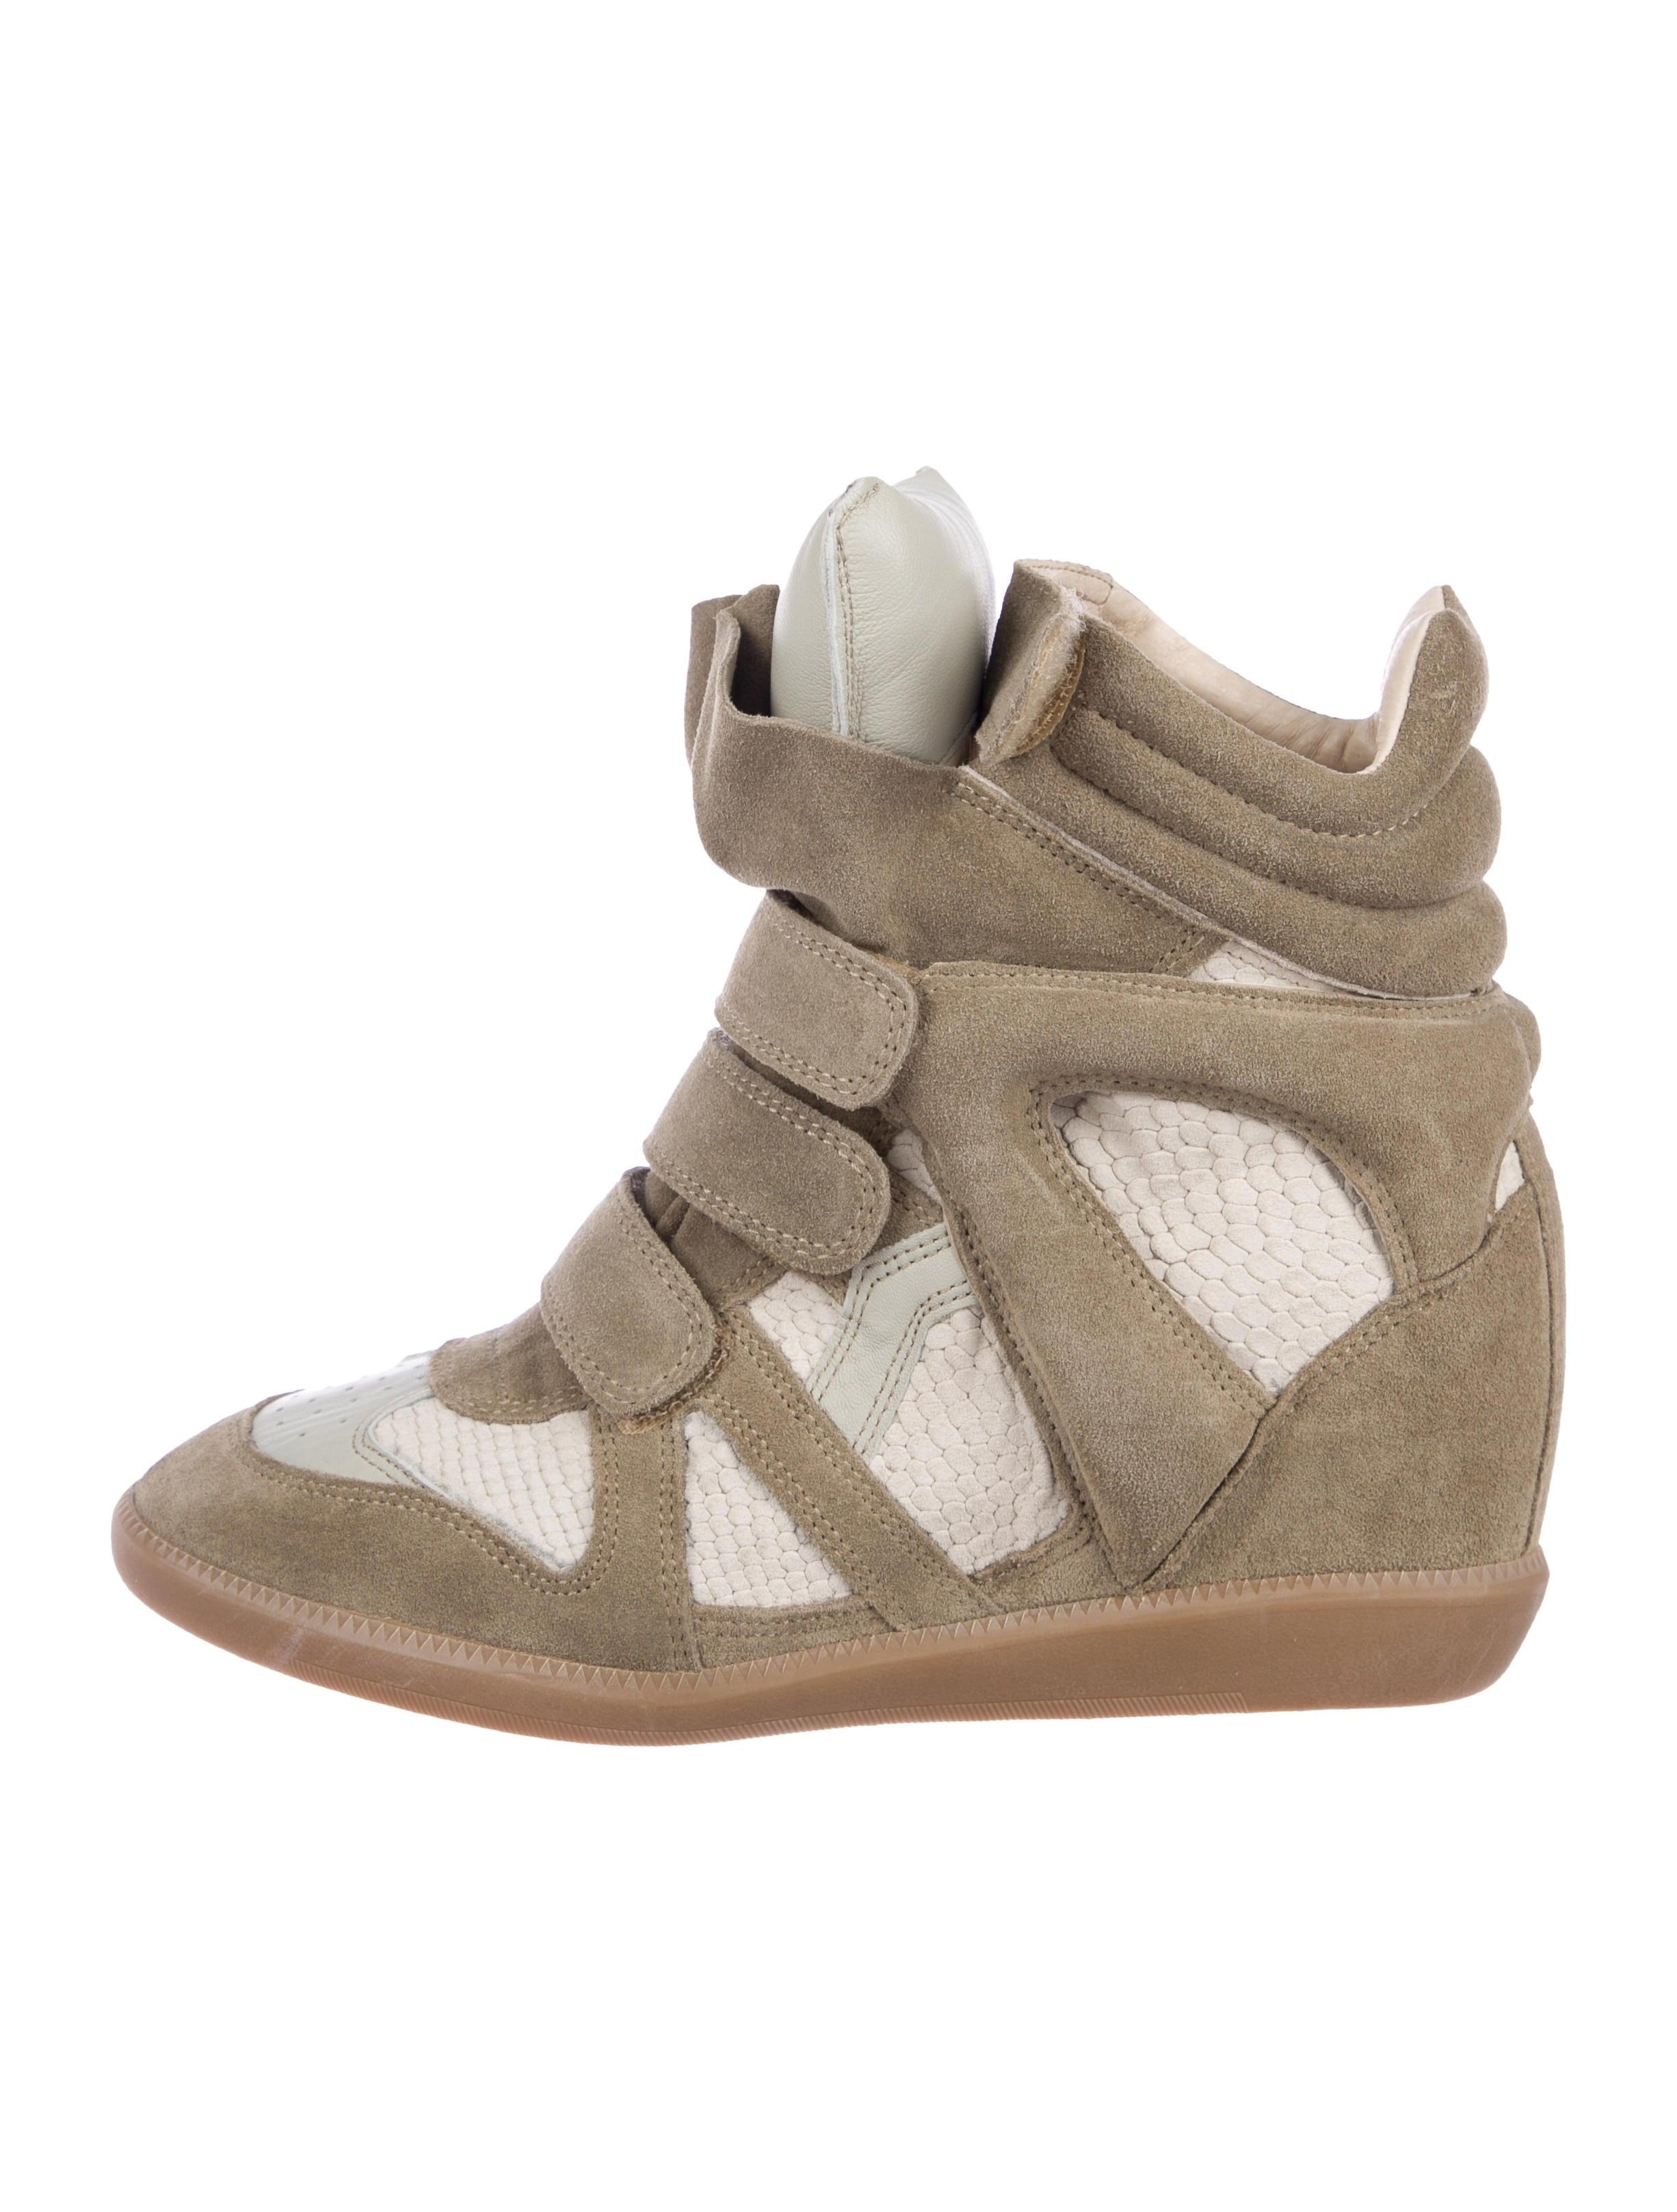 b609de53cb8e Isabel Marant Bazil Wedge Sneakers - Shoes - ISA65754